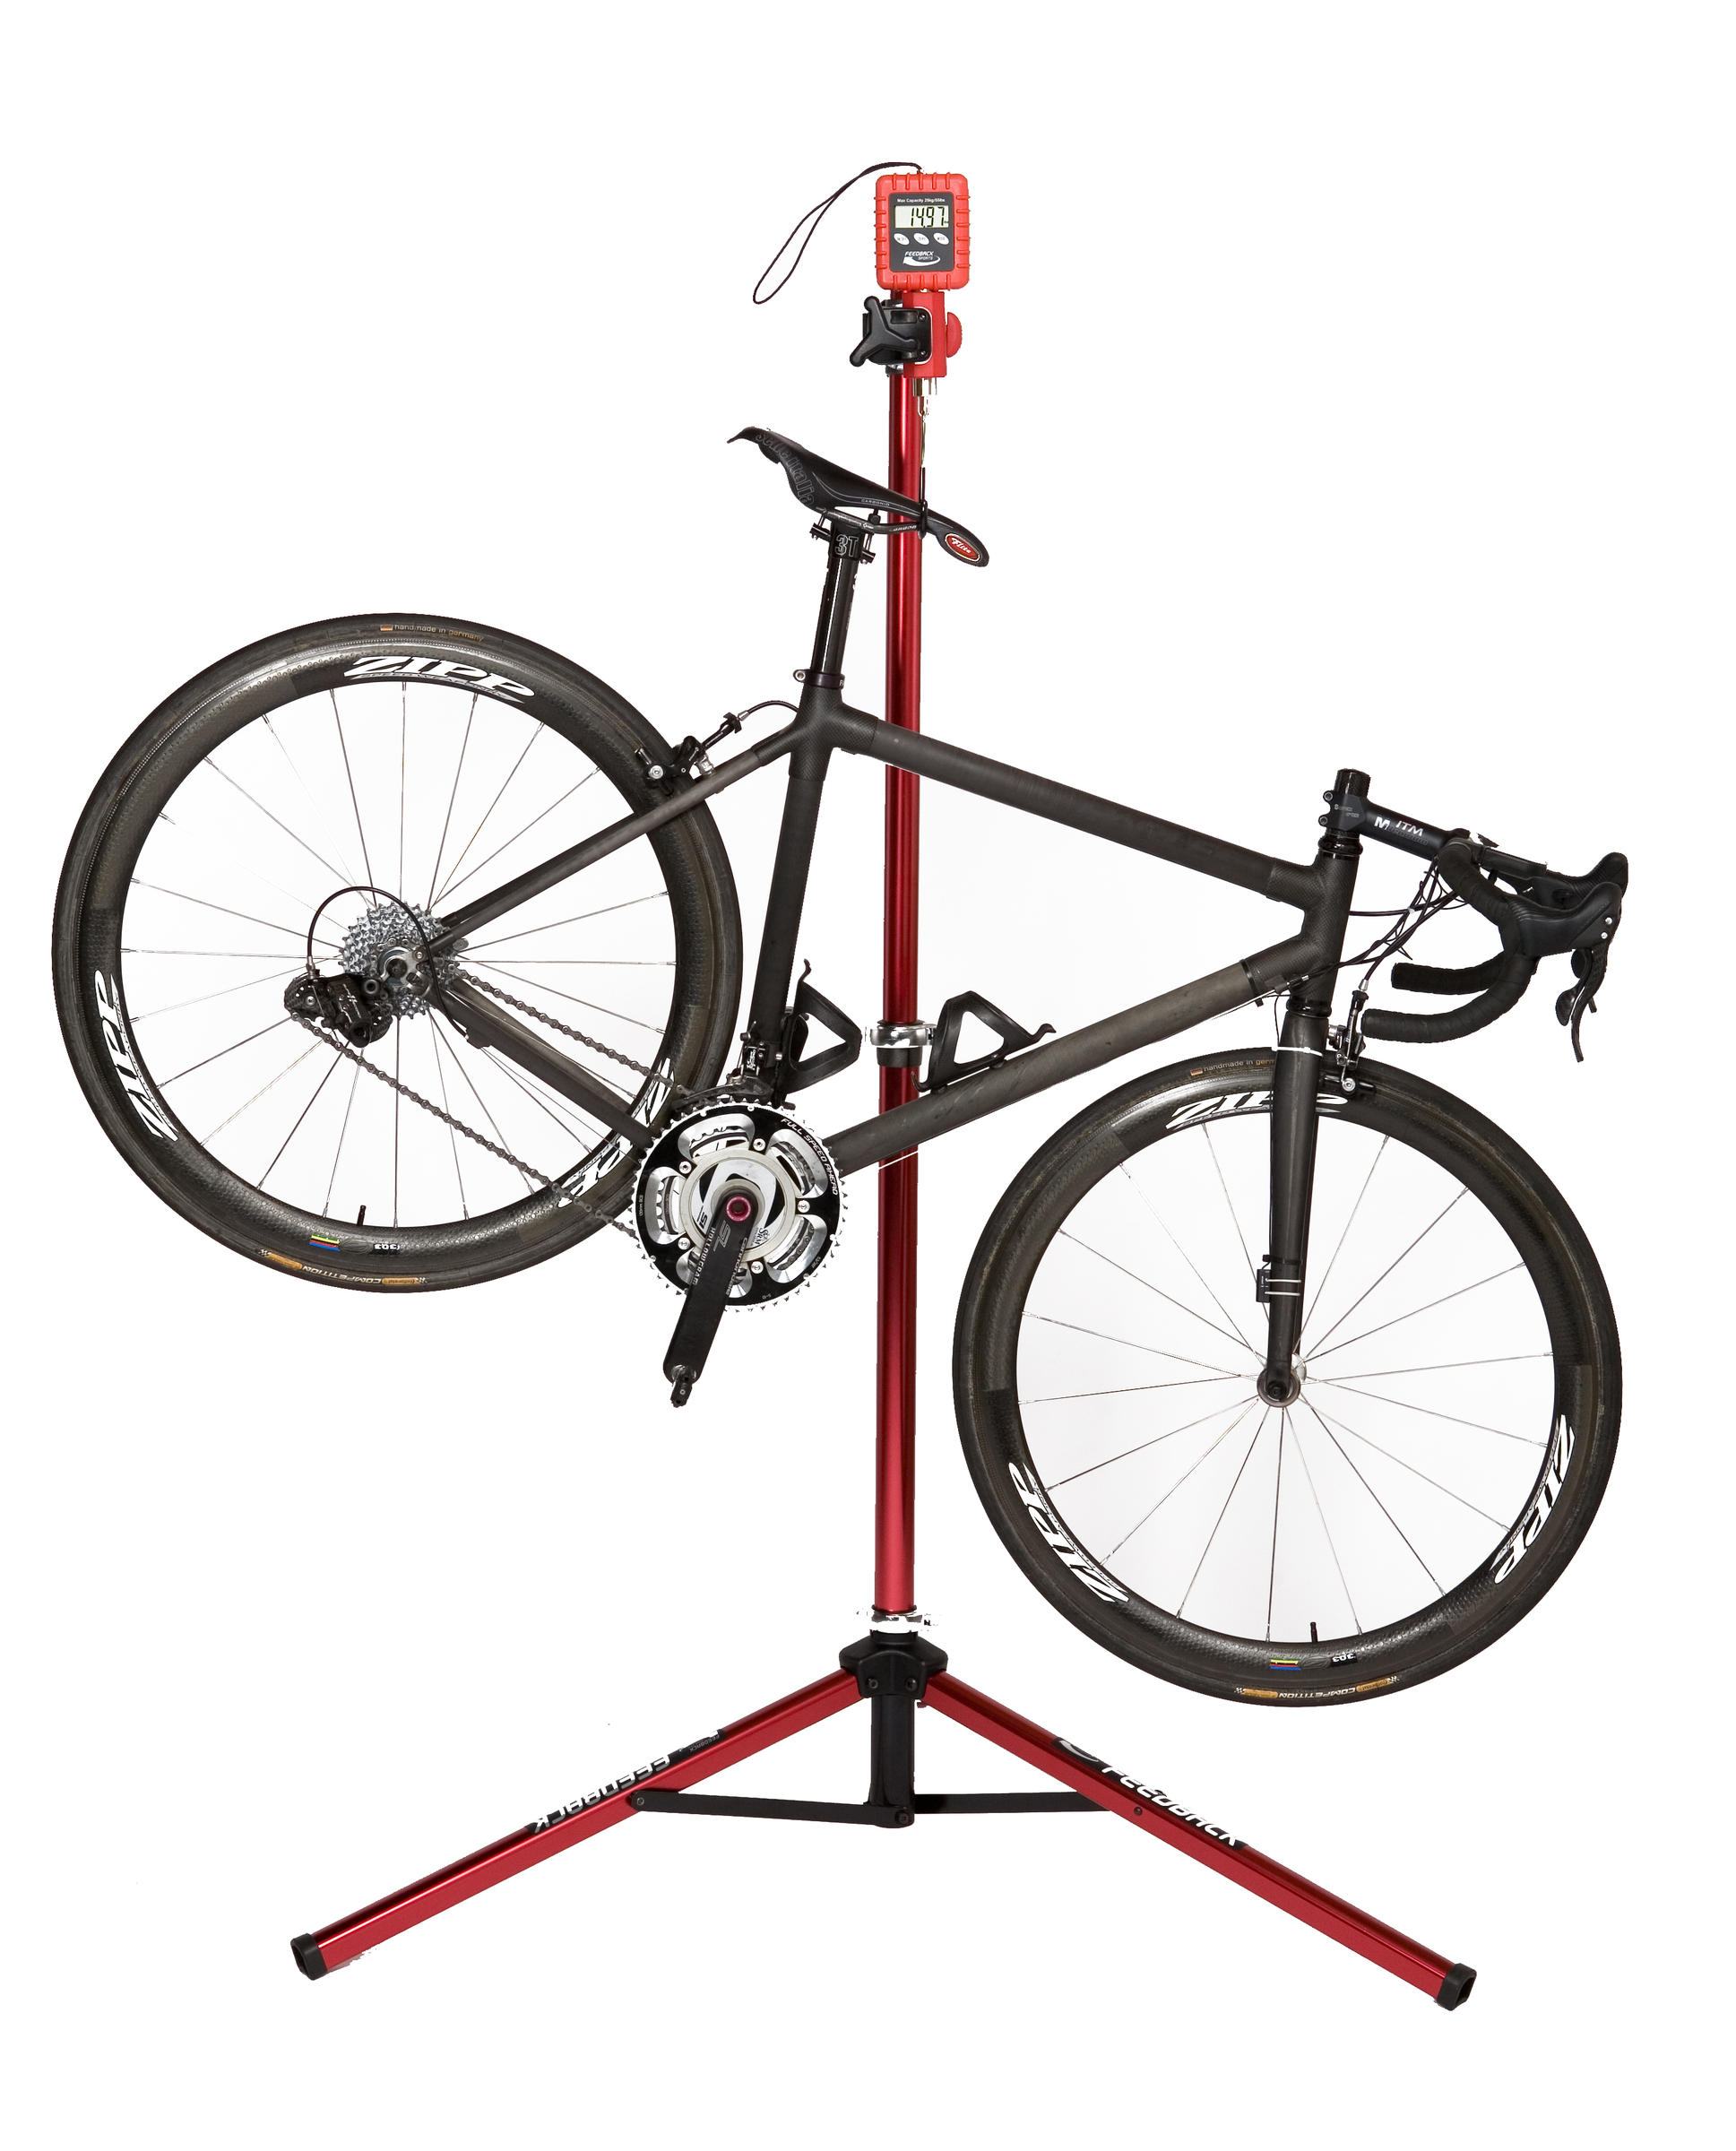 Feedback Sports Alpine Digital Scale.